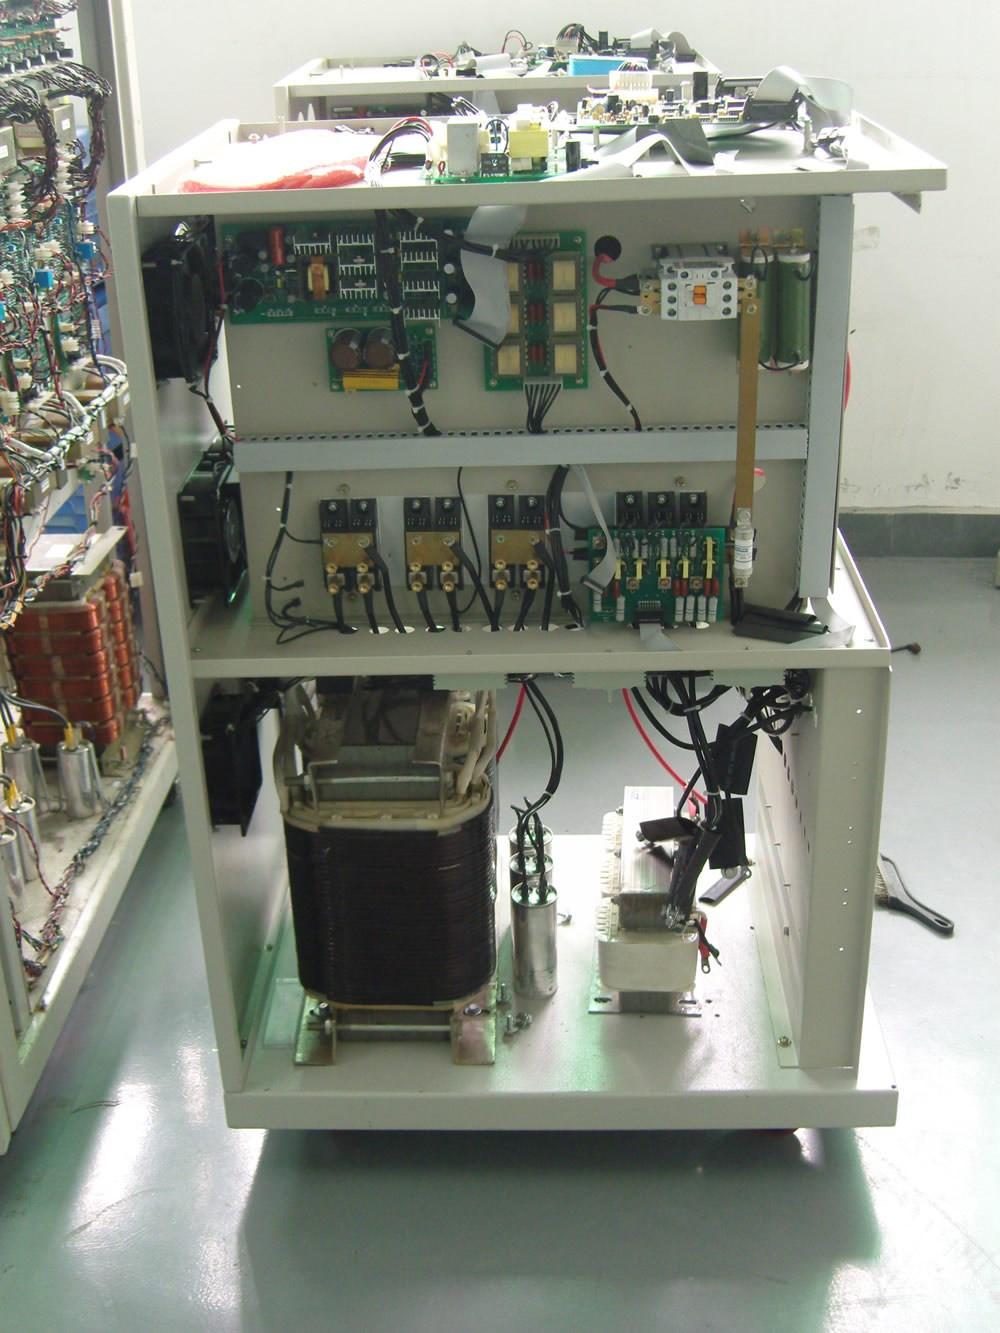 Bosin 照明用 ups不間斷電源200KW蓄電池